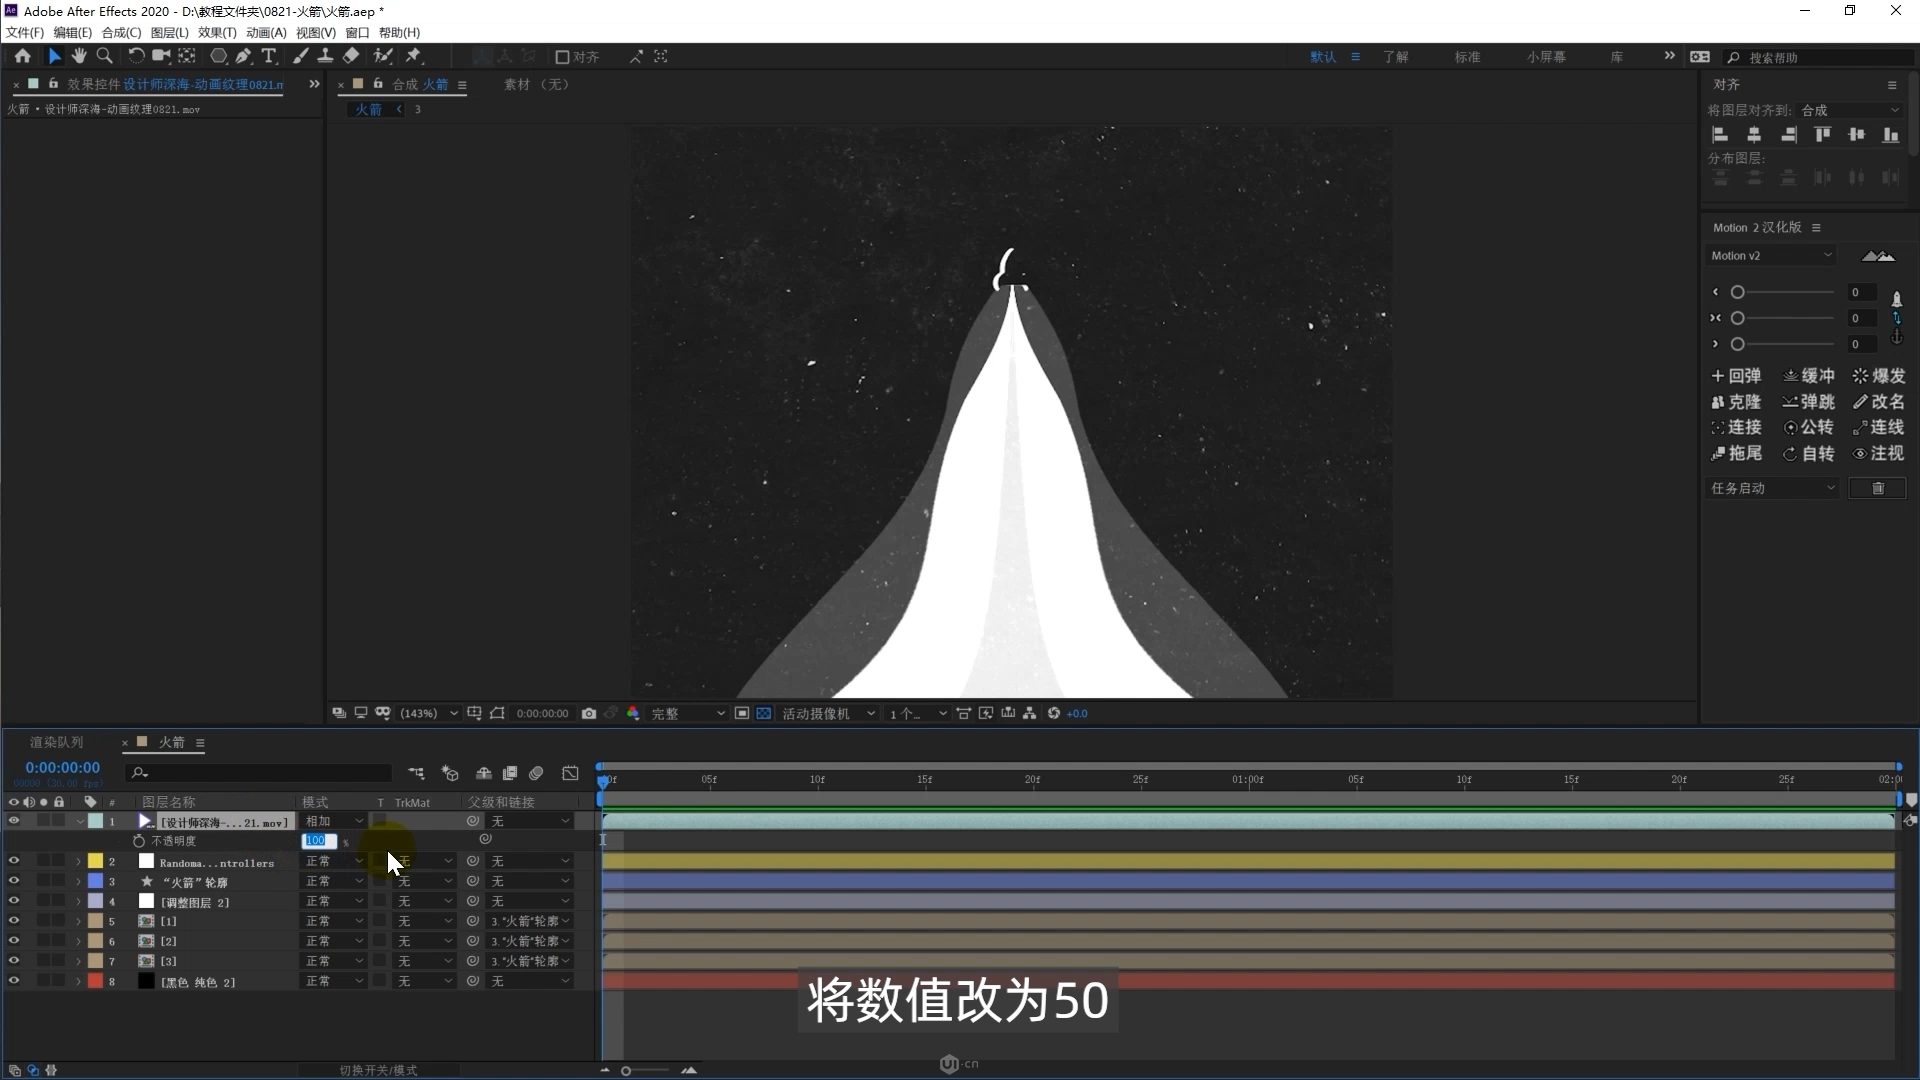 AE如何制作简单的太空旅行MG动画(12)